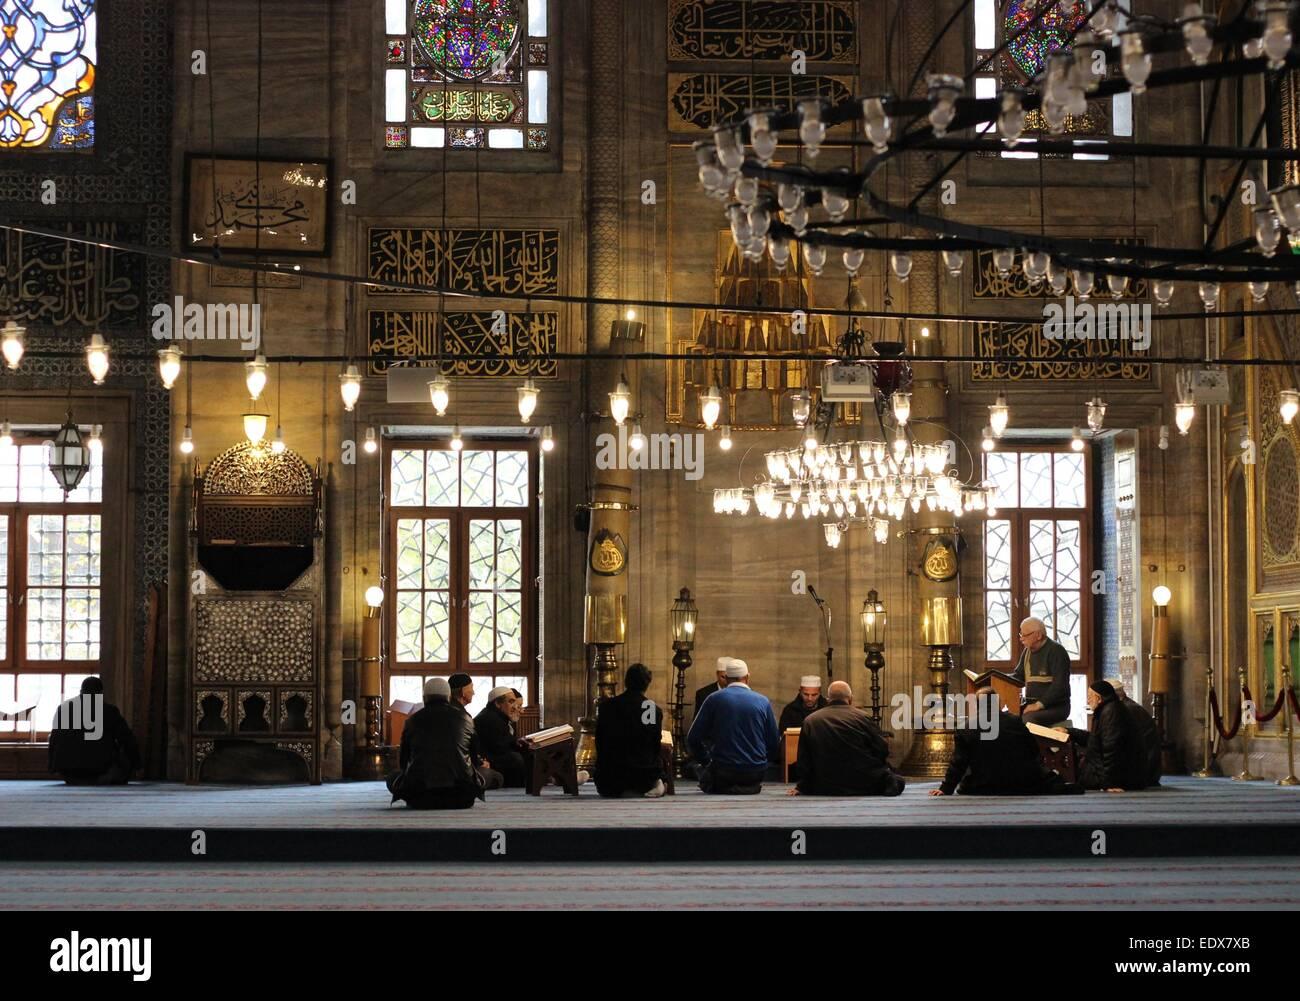 Men reading Qur'an and praying, Yeni Cami (New Mosque), Eminonu, Istanbul, Turkey. - Stock Image